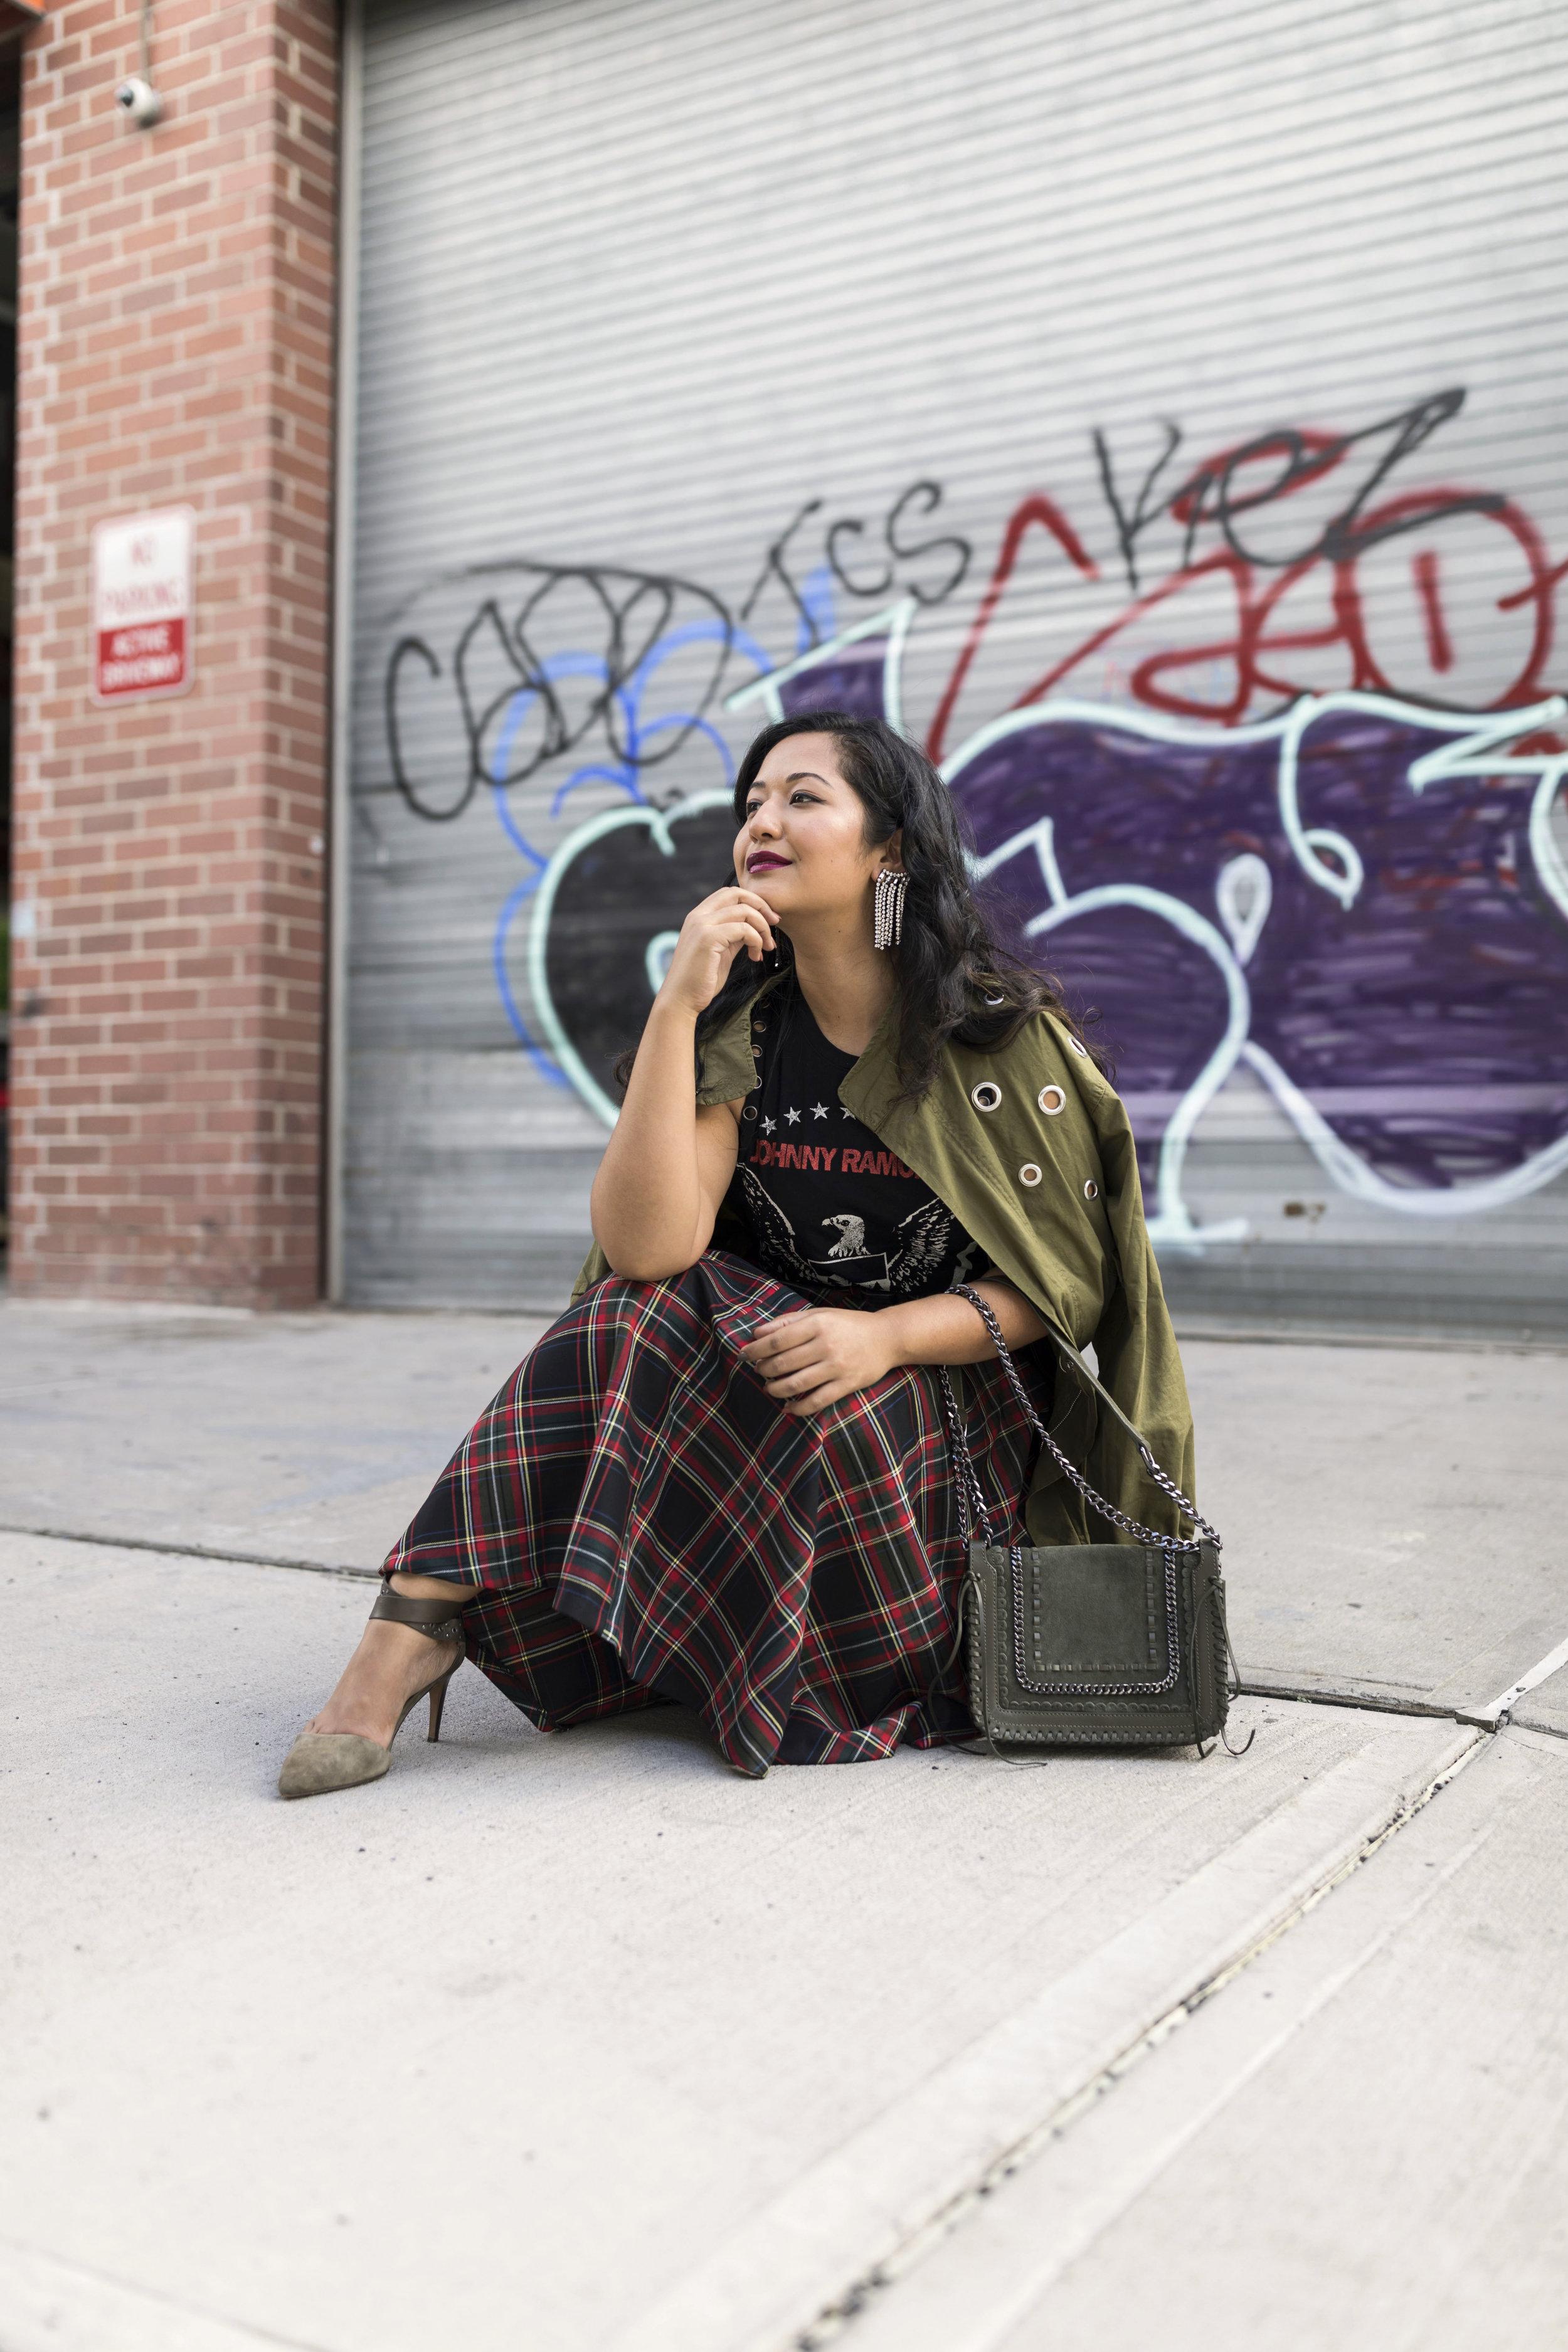 Krity S x Fall Trends x Plaid with a Punk Twist9.jpg